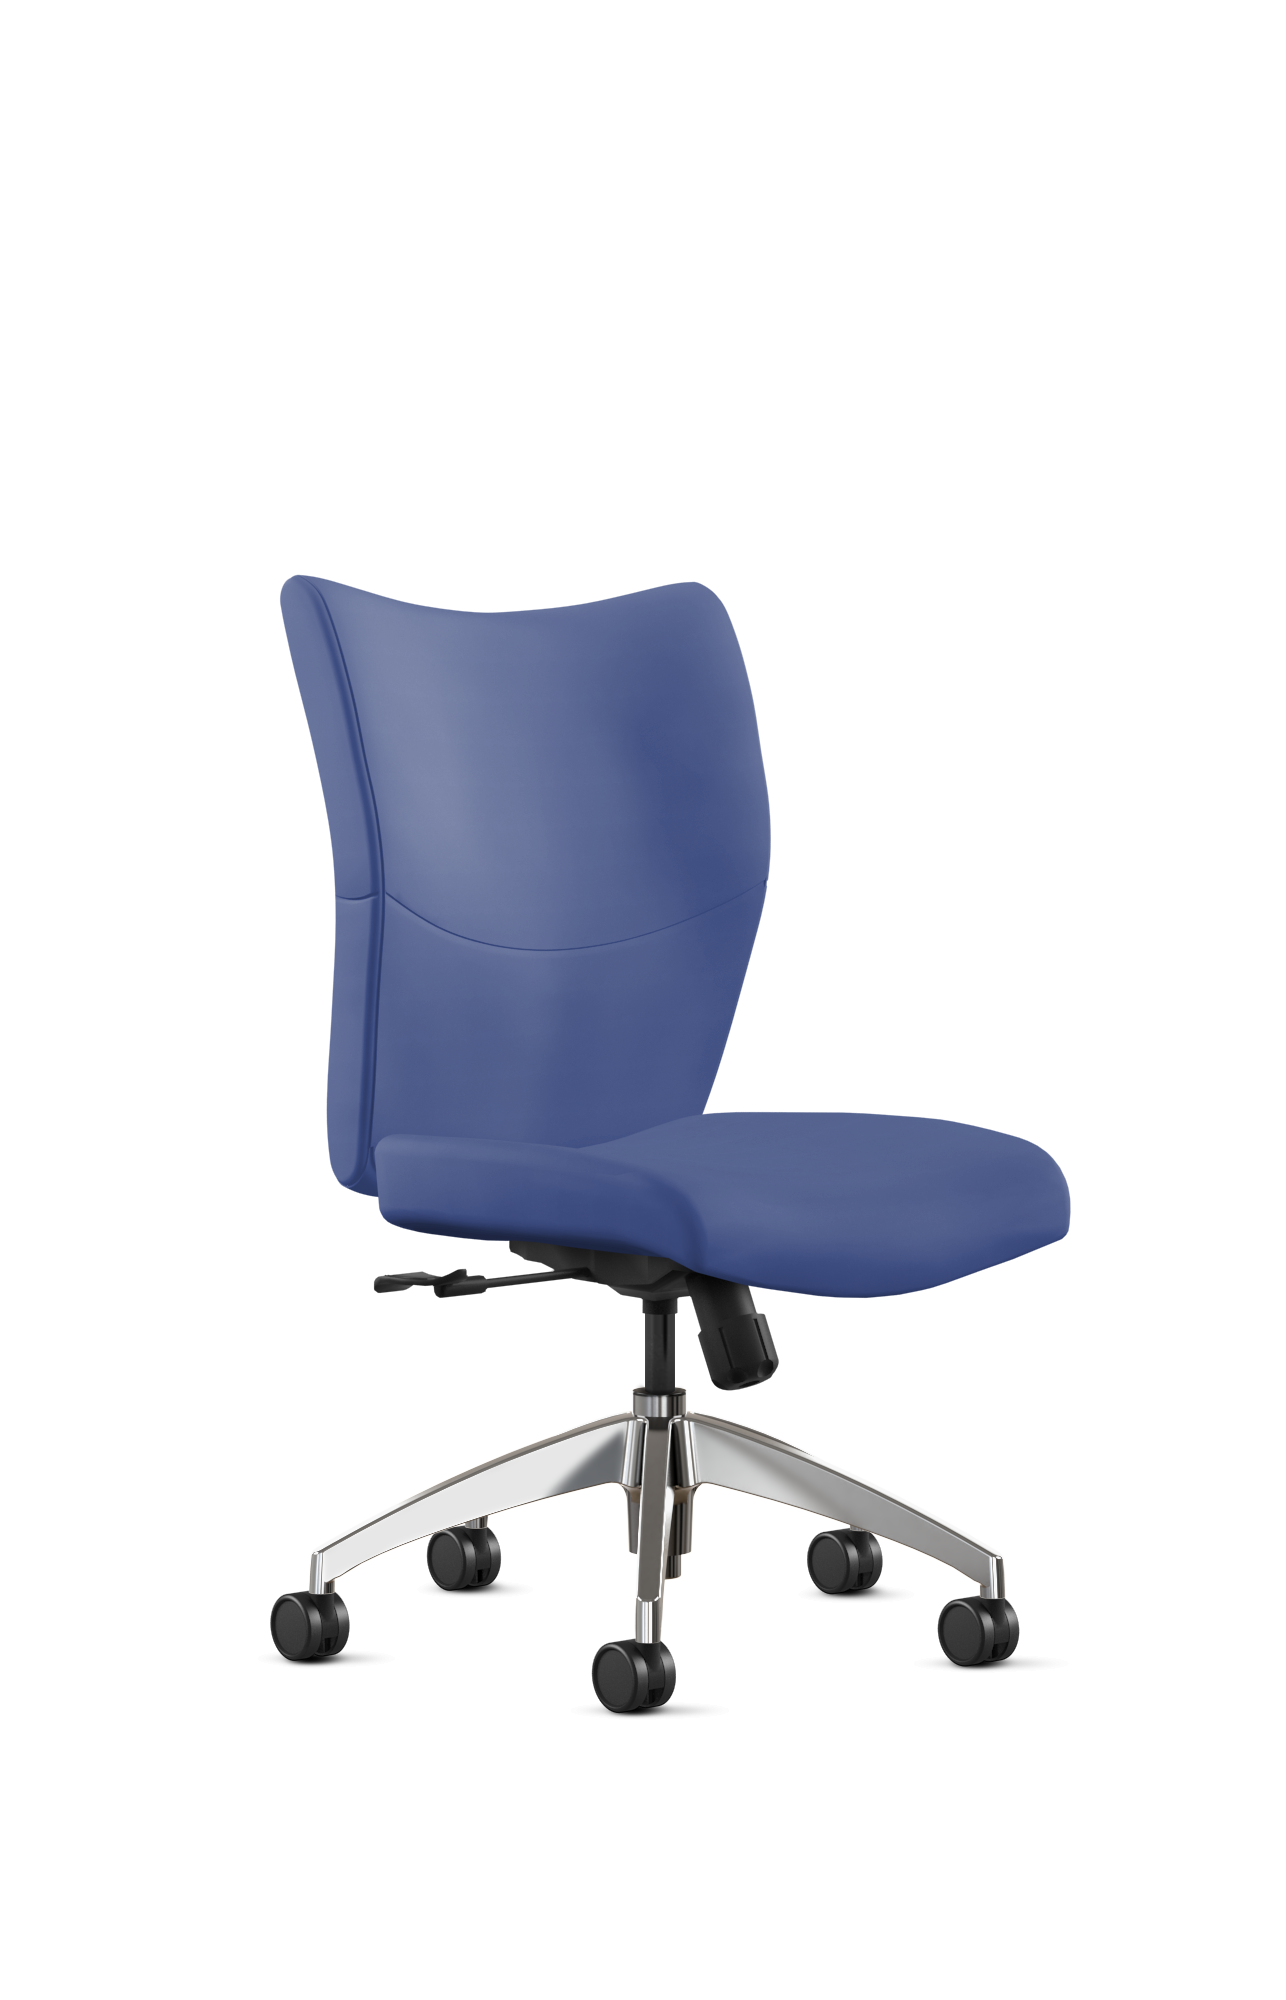 Julianne Blue Leather Arm Chair Leather Desk Cute Desk Chair Chair